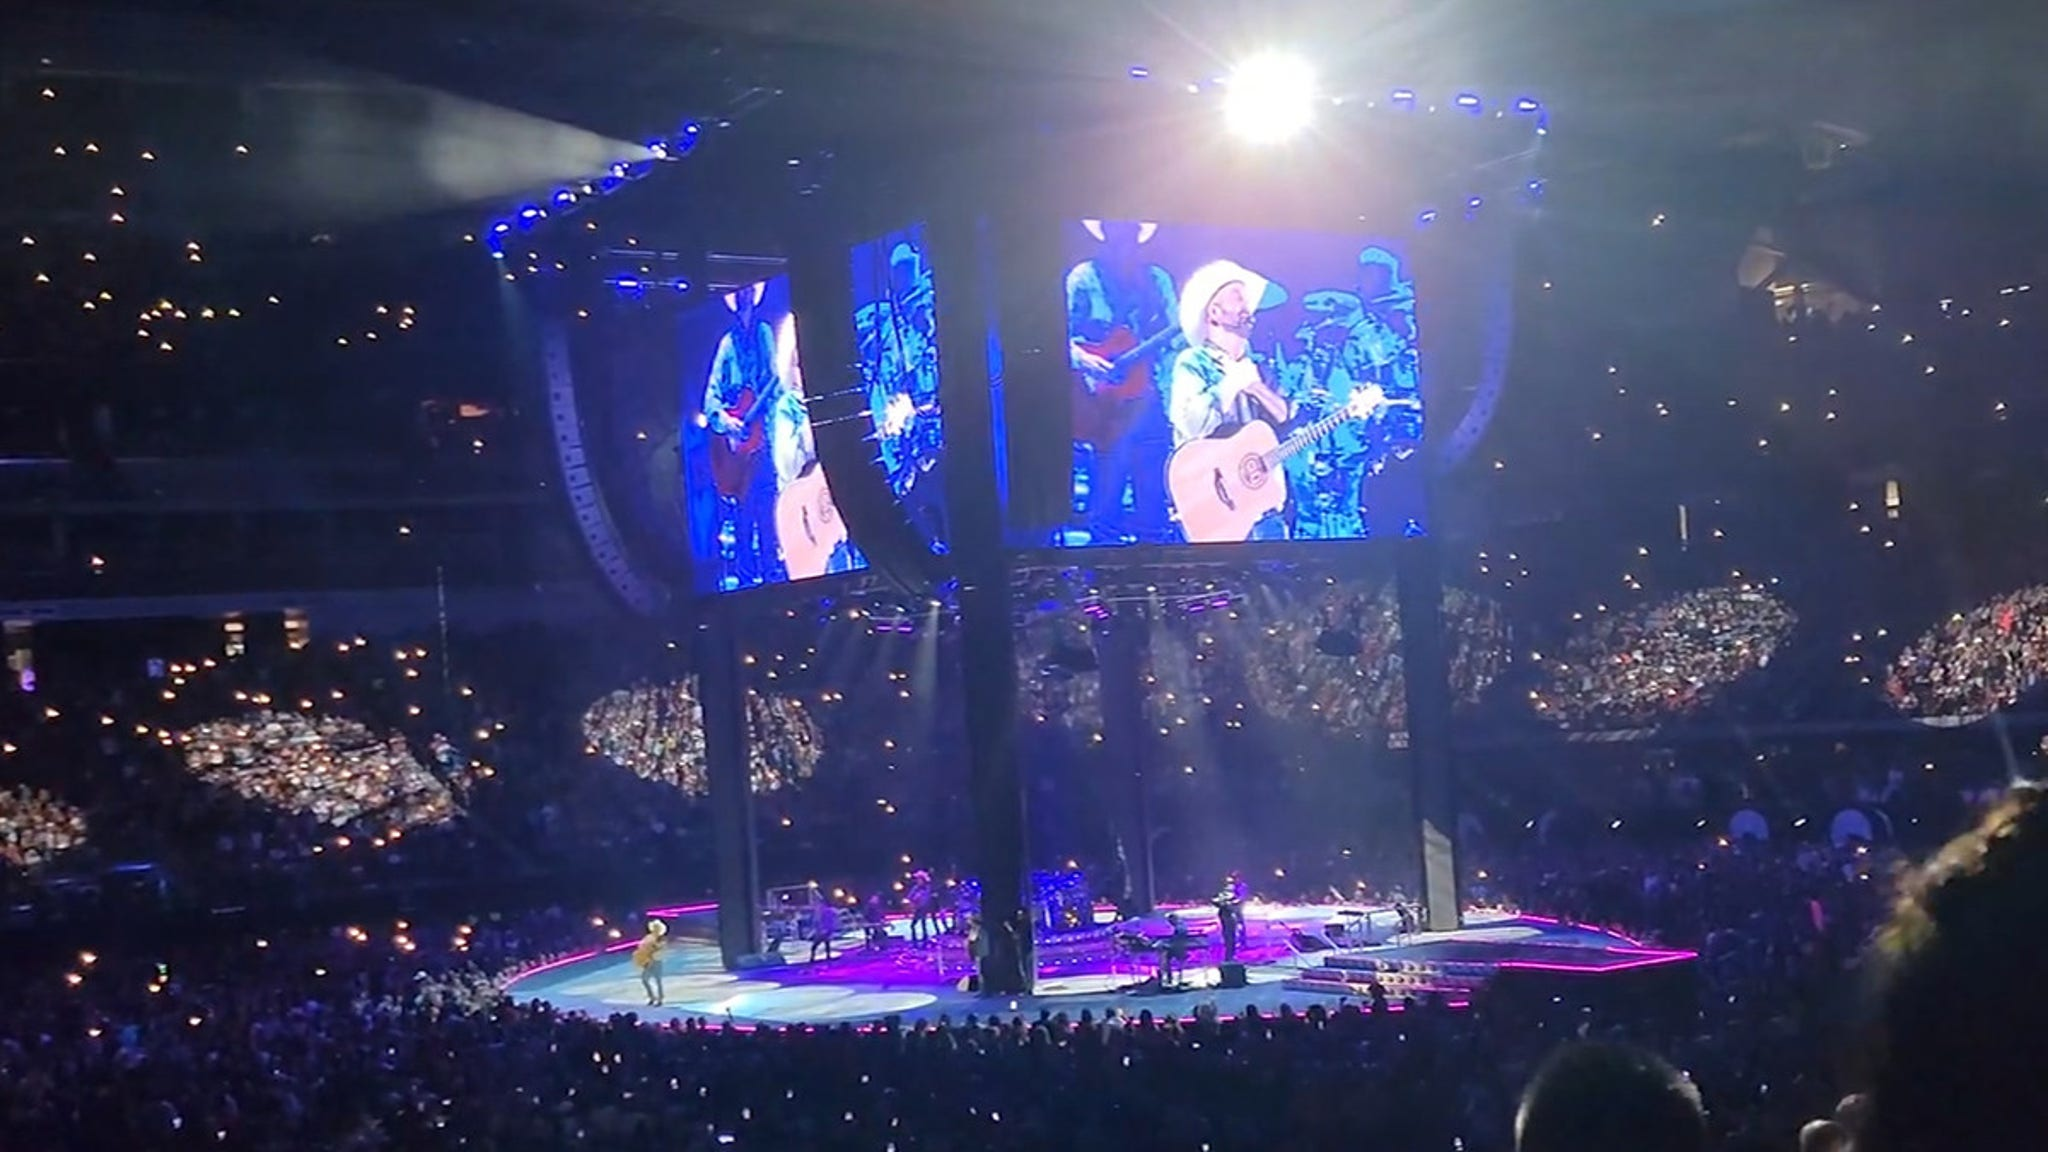 Garth Brooks Brings Back Stadium Concerts with Huge Las Vegas Show